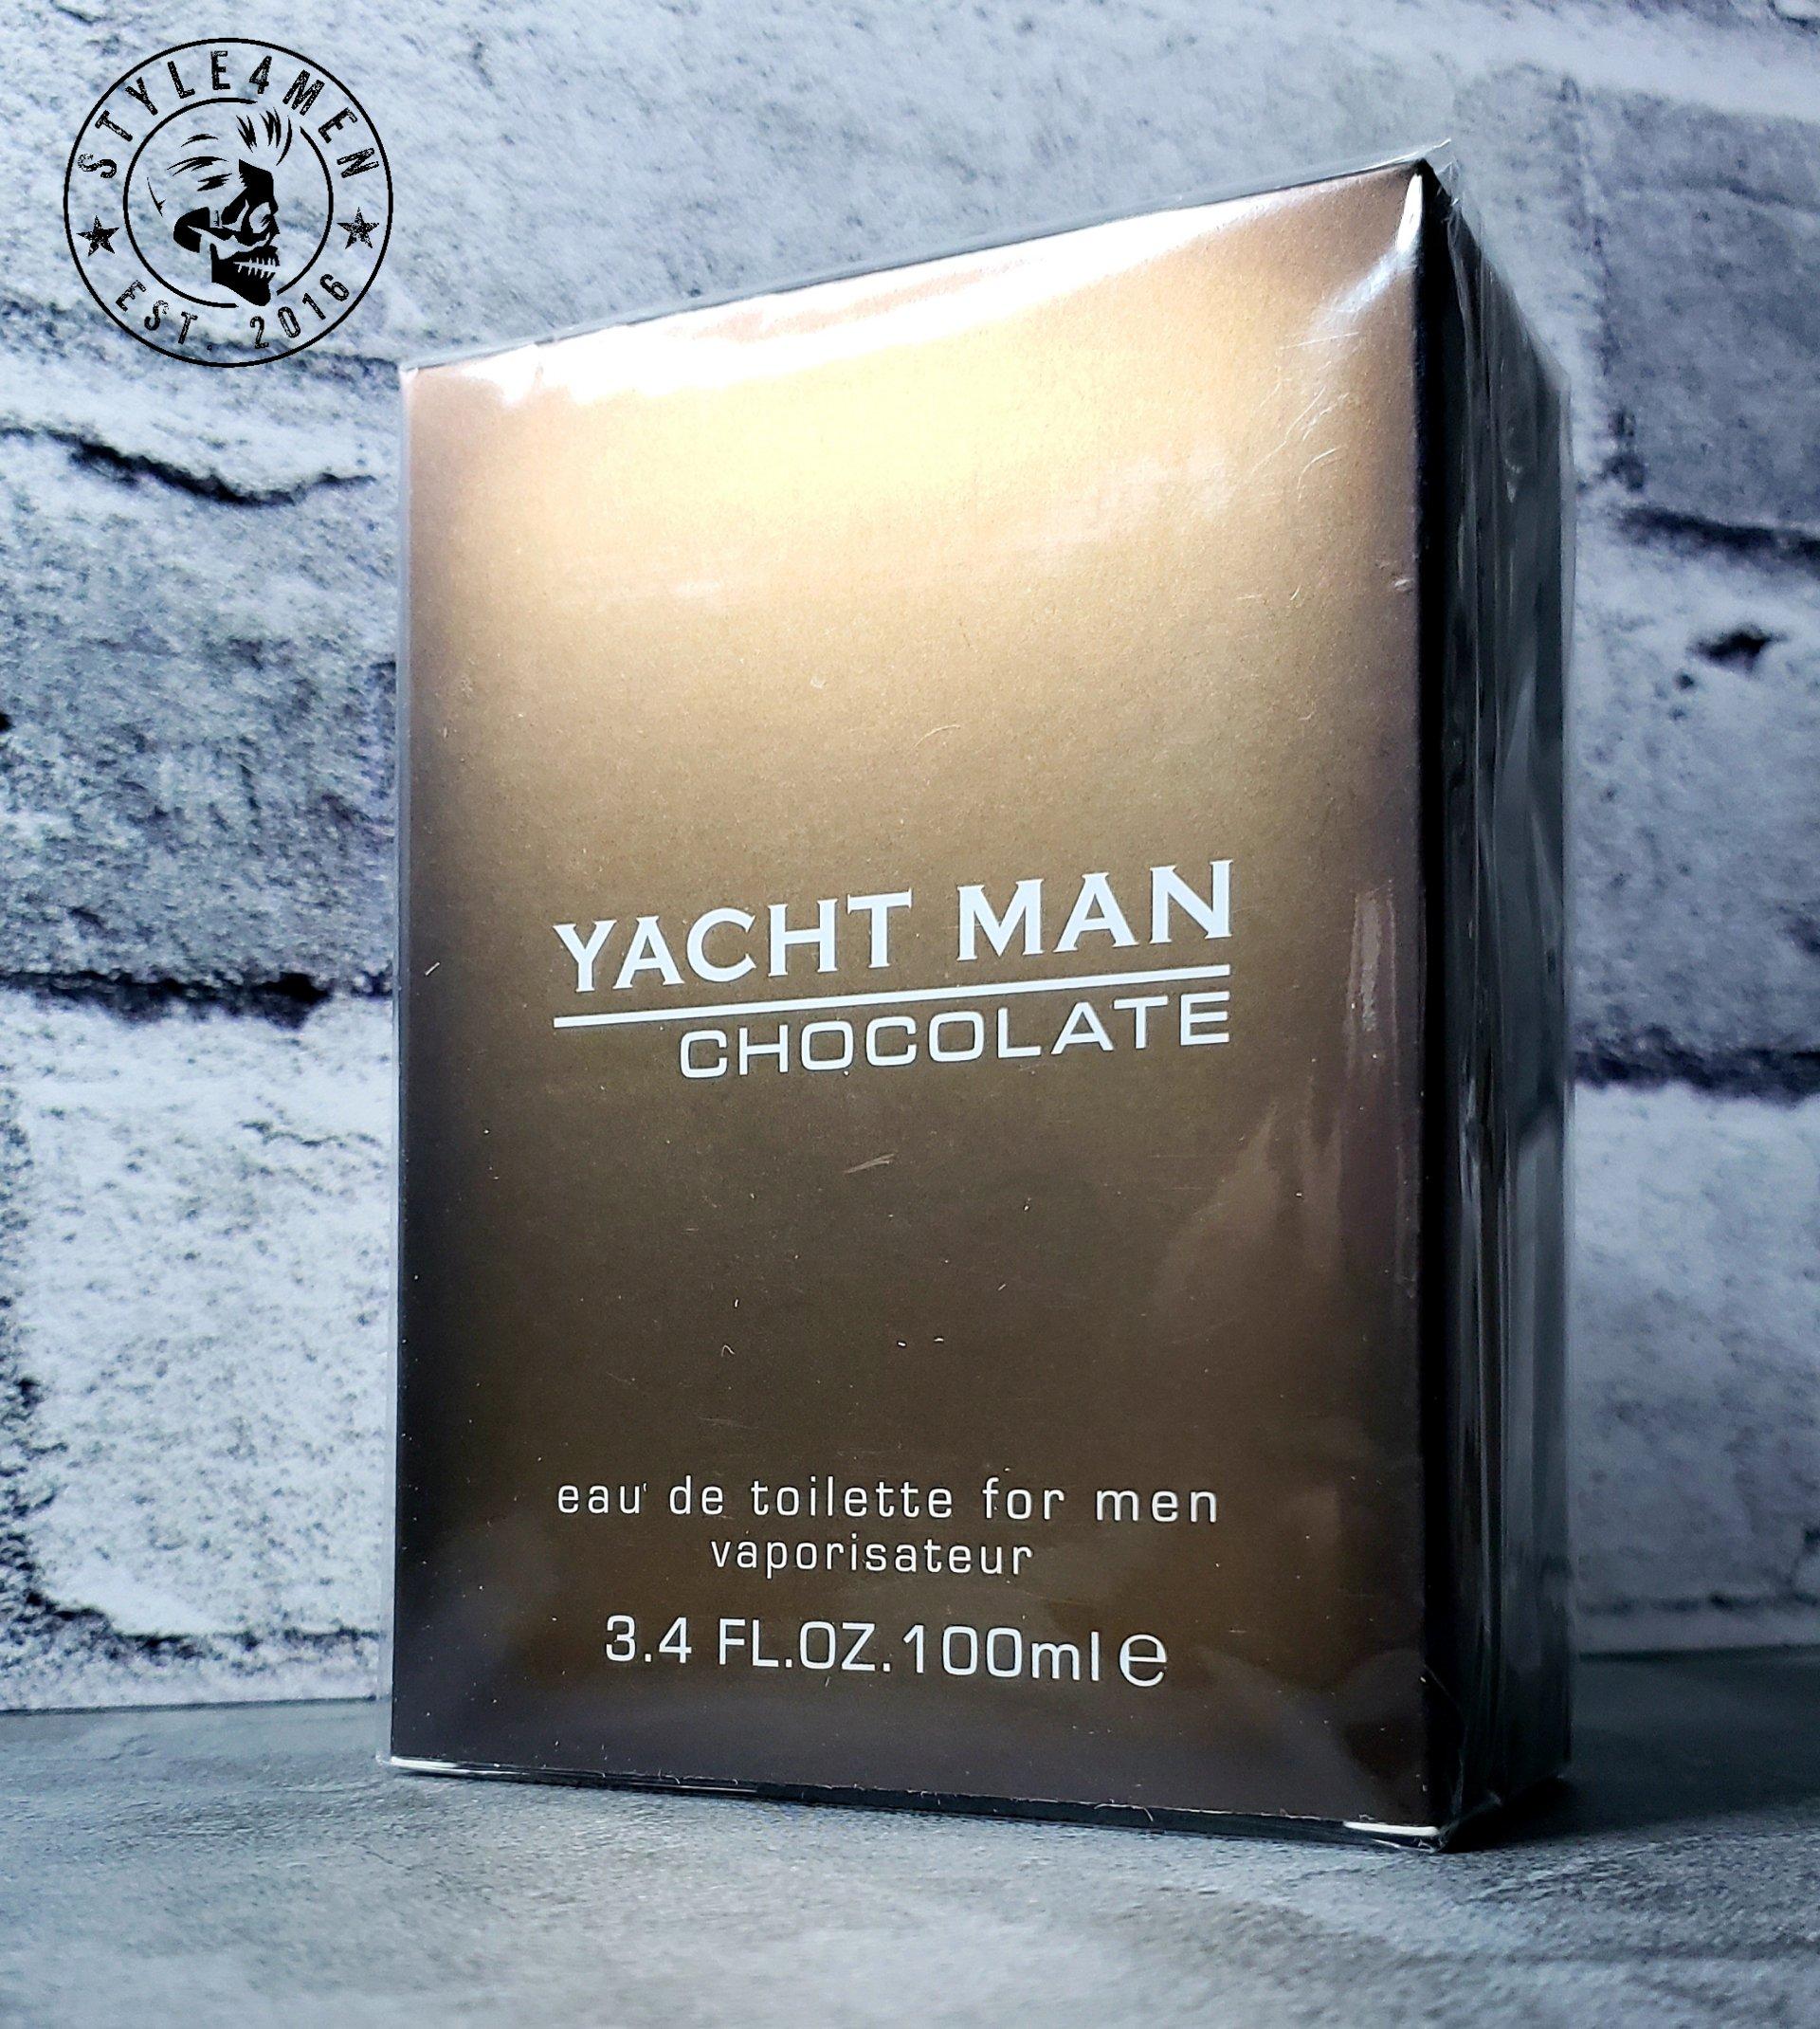 Yacht Man Chocolate